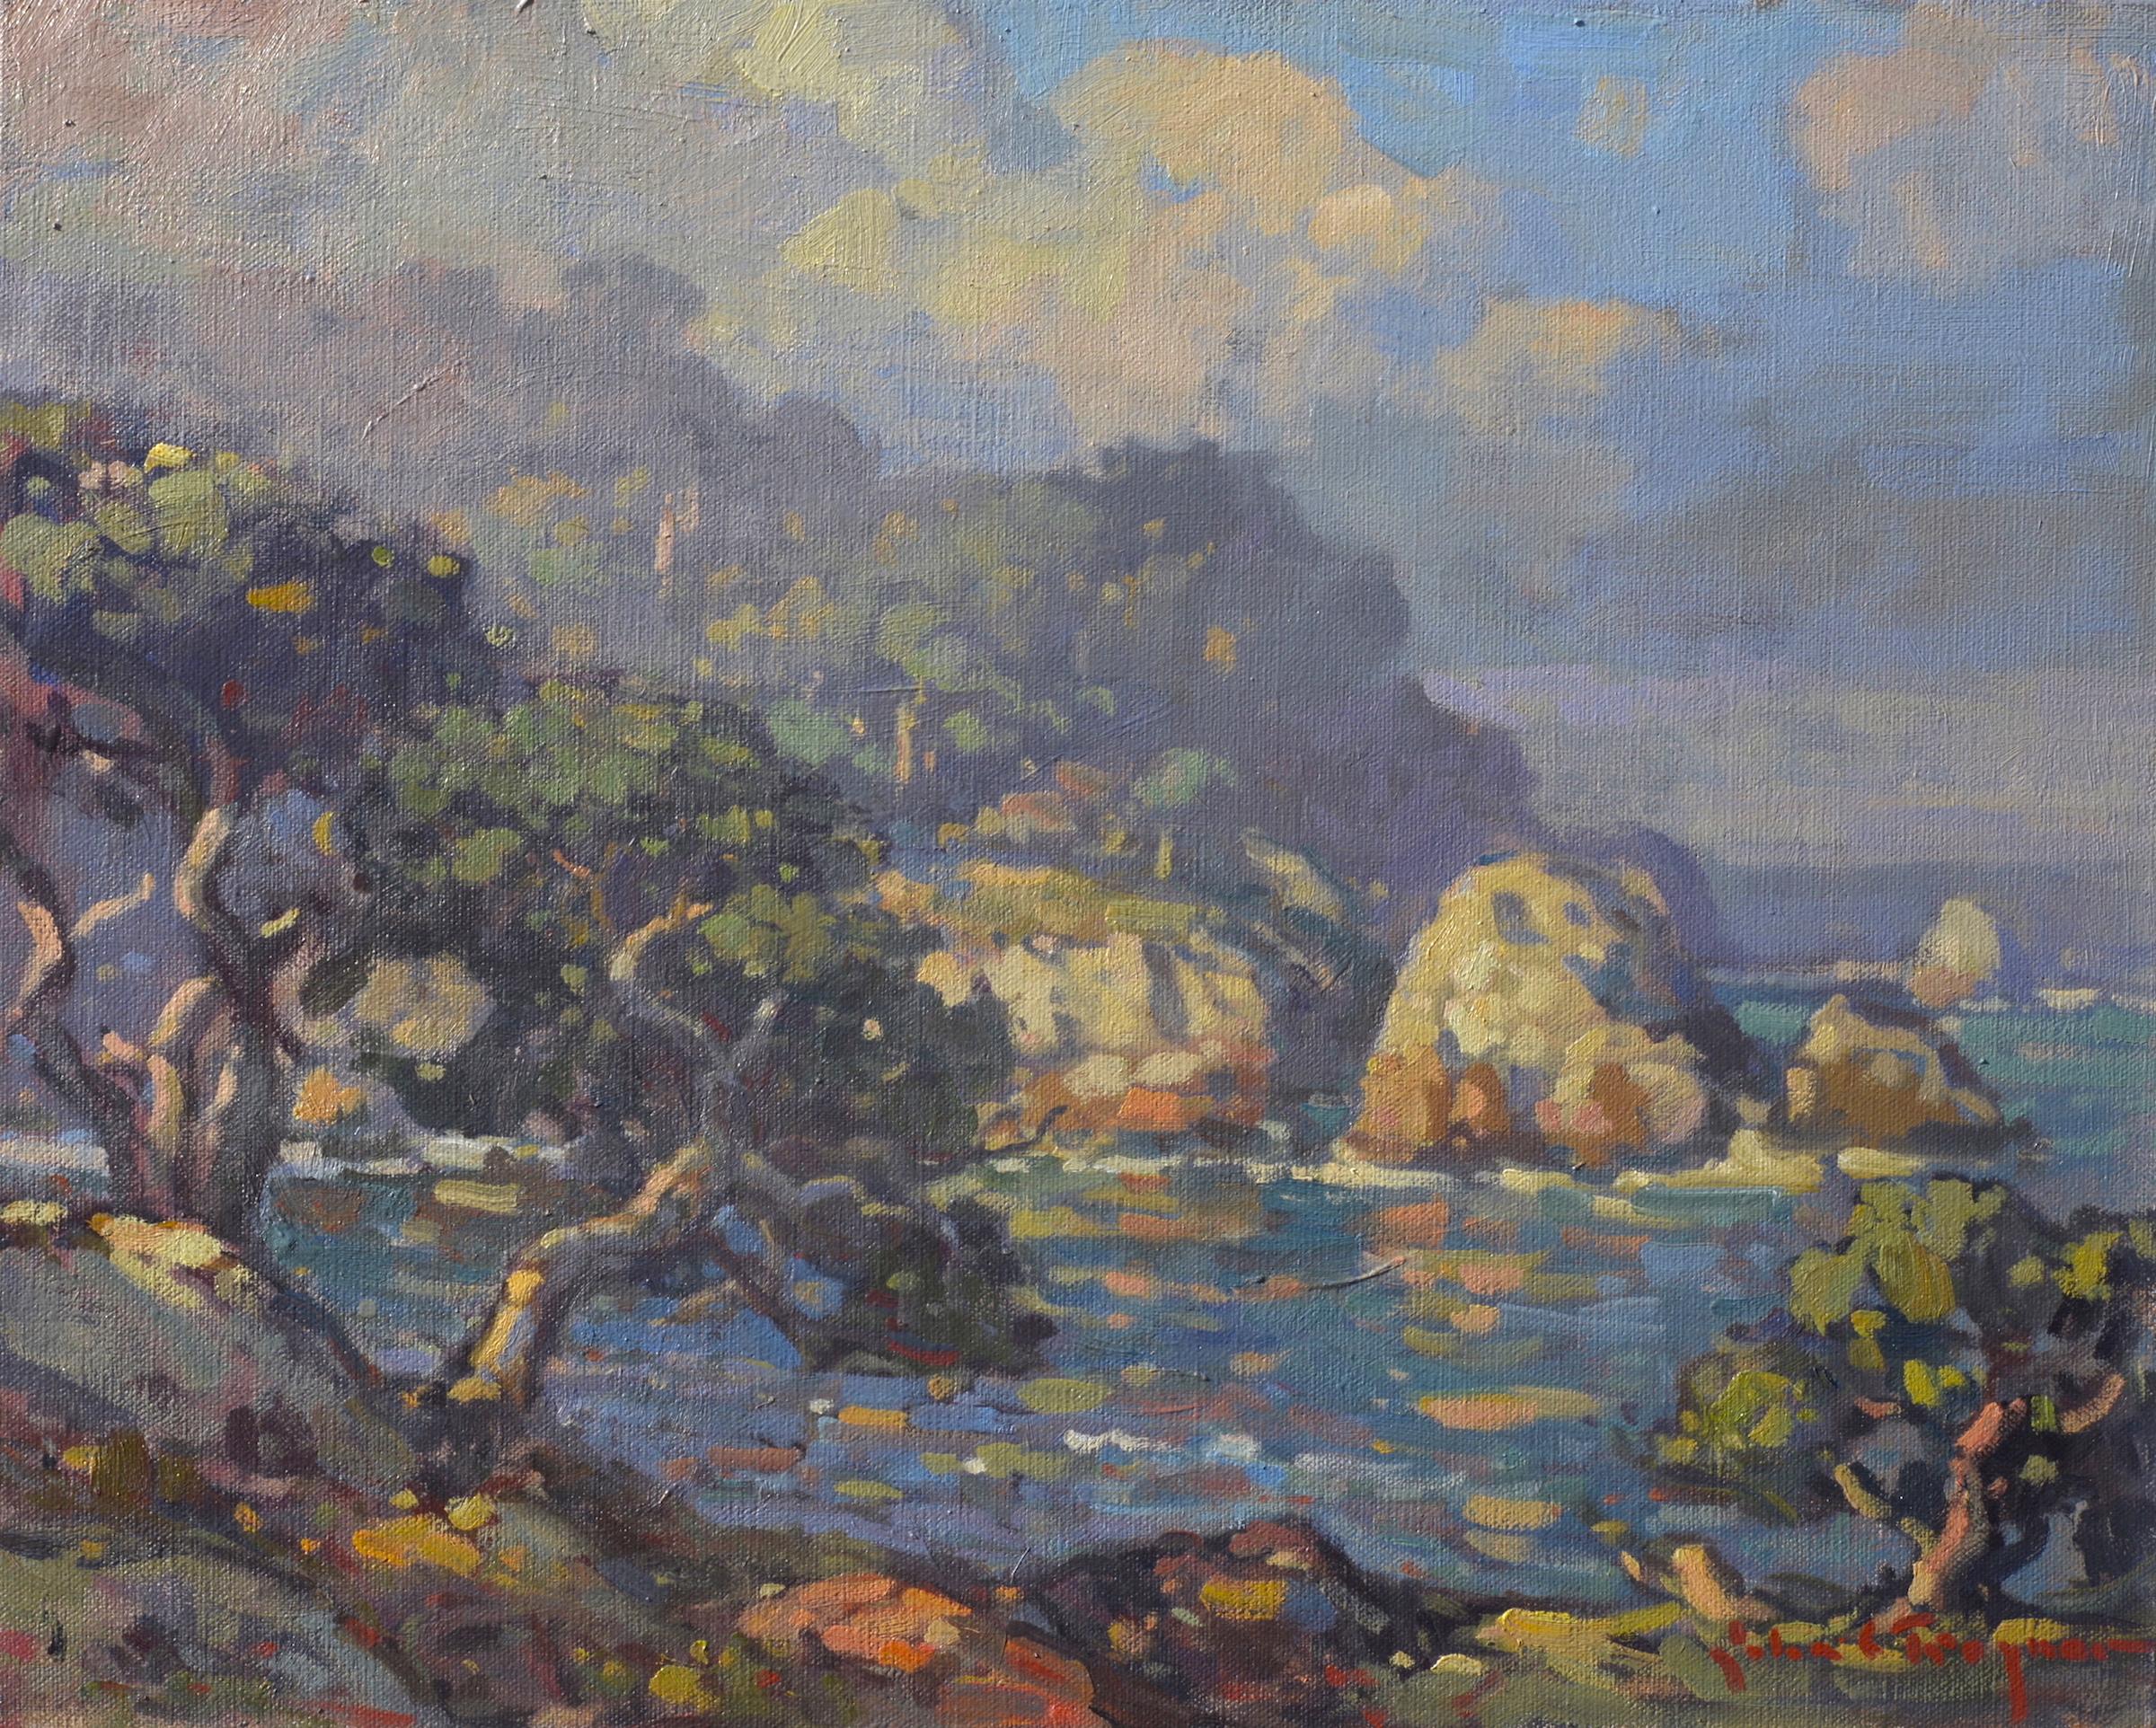 Landscape john c traynor for Blue fish cove